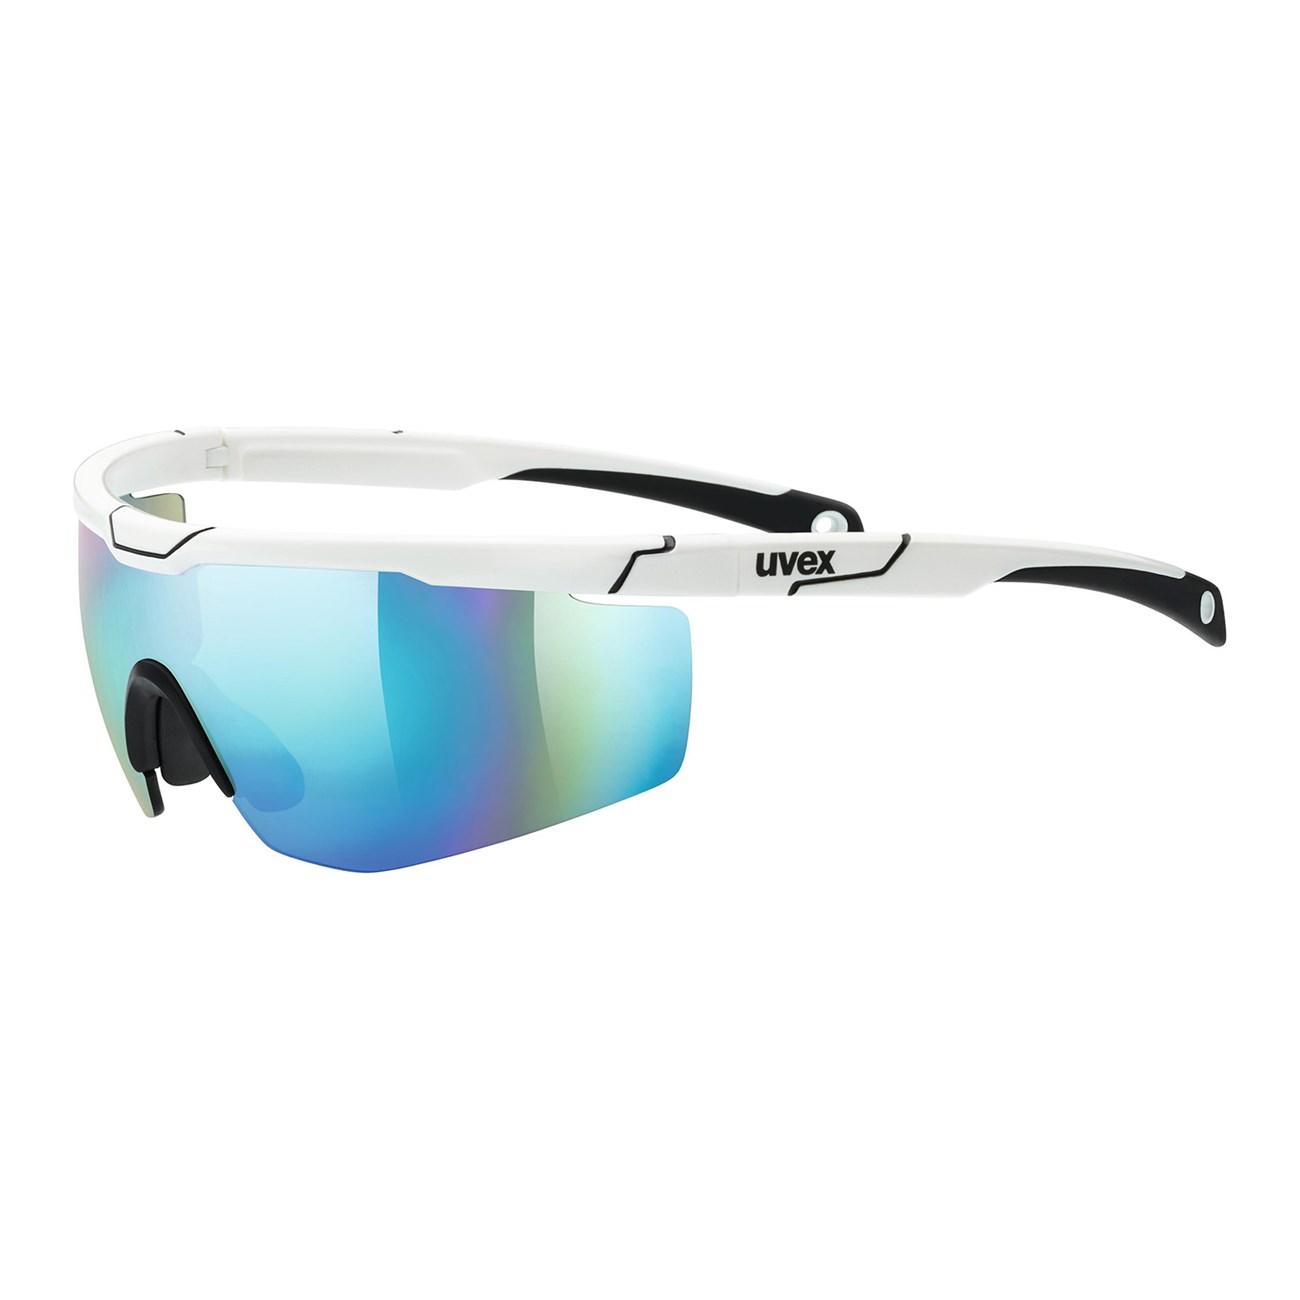 UVEX sportstyle 117   Γυαλιά Ηλίου για Τρέξιμο  3cf88862eb3